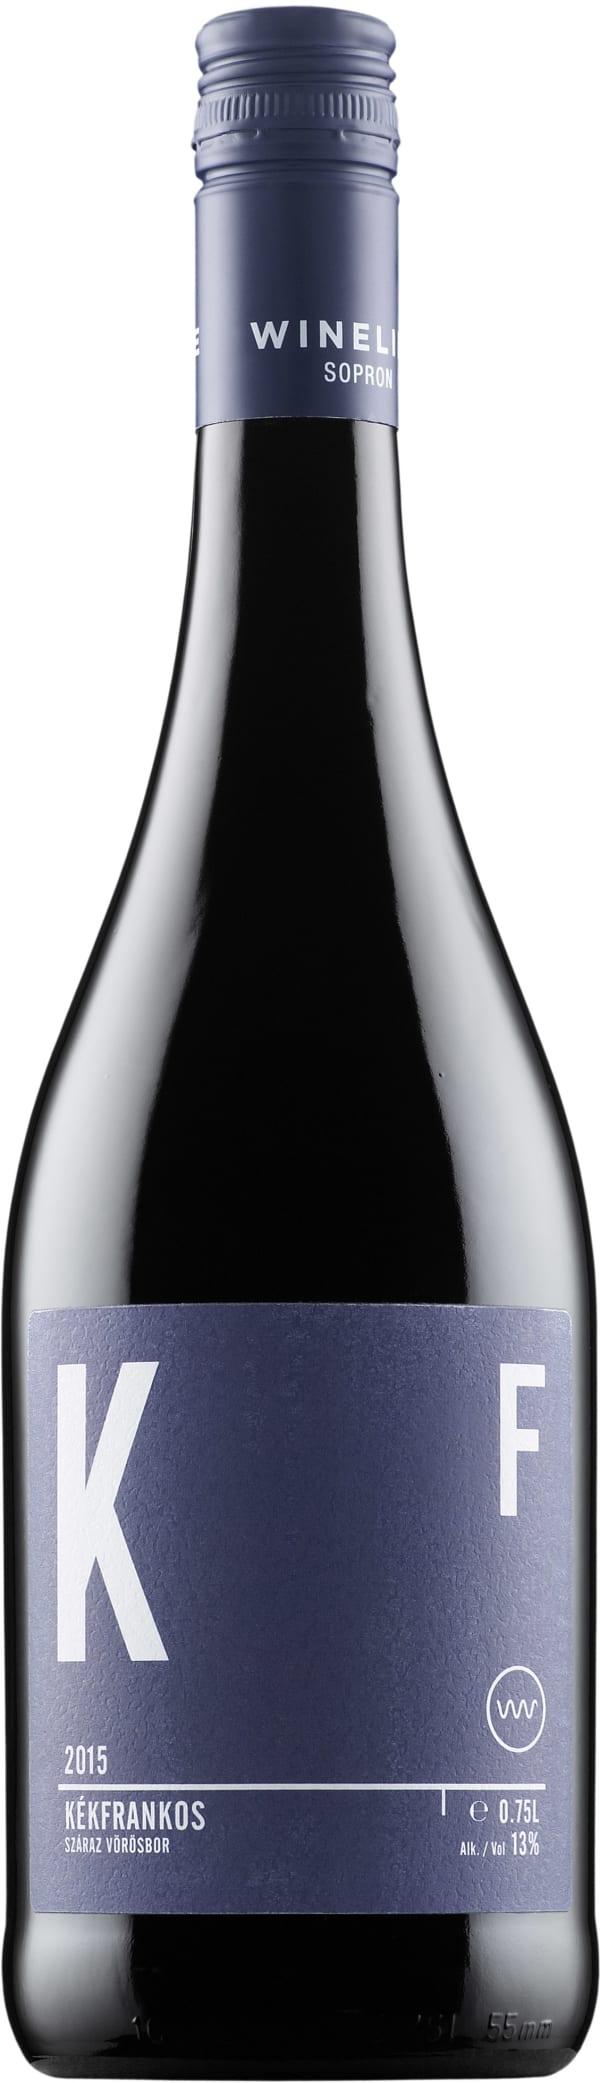 Winelife KF Kékfrankos 2015